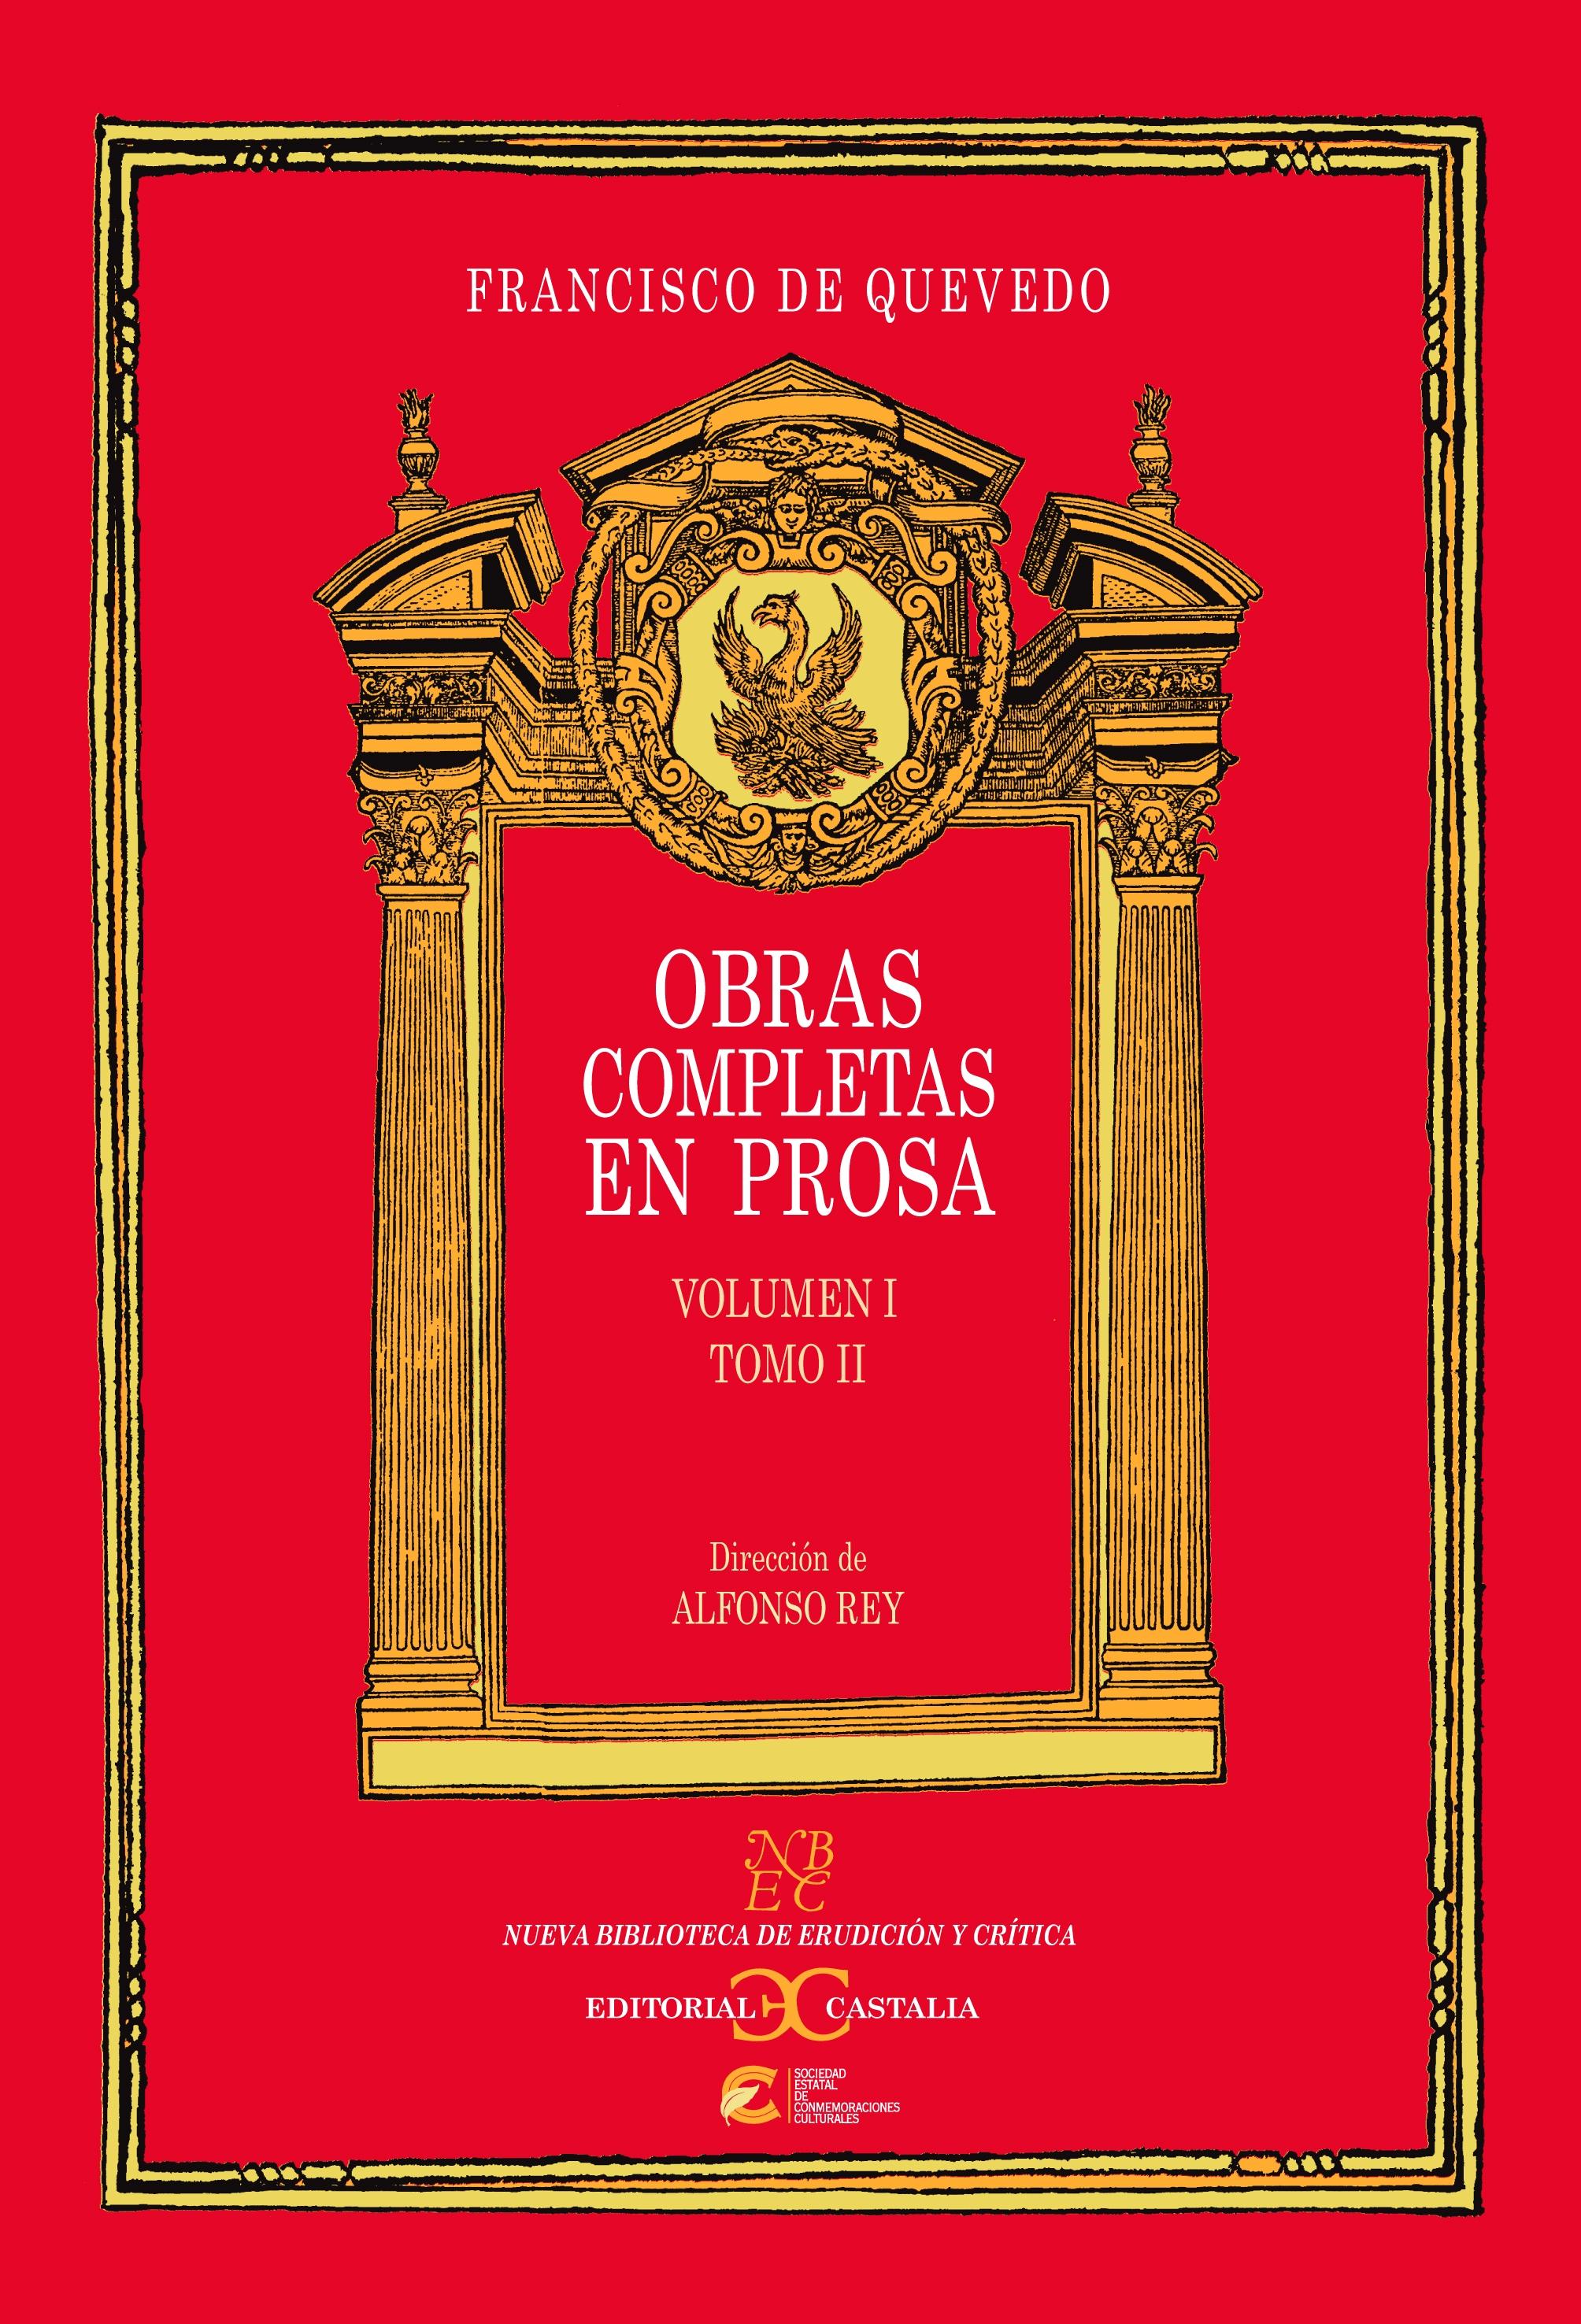 Obras completas en prosa. Volumen I, Tomo II